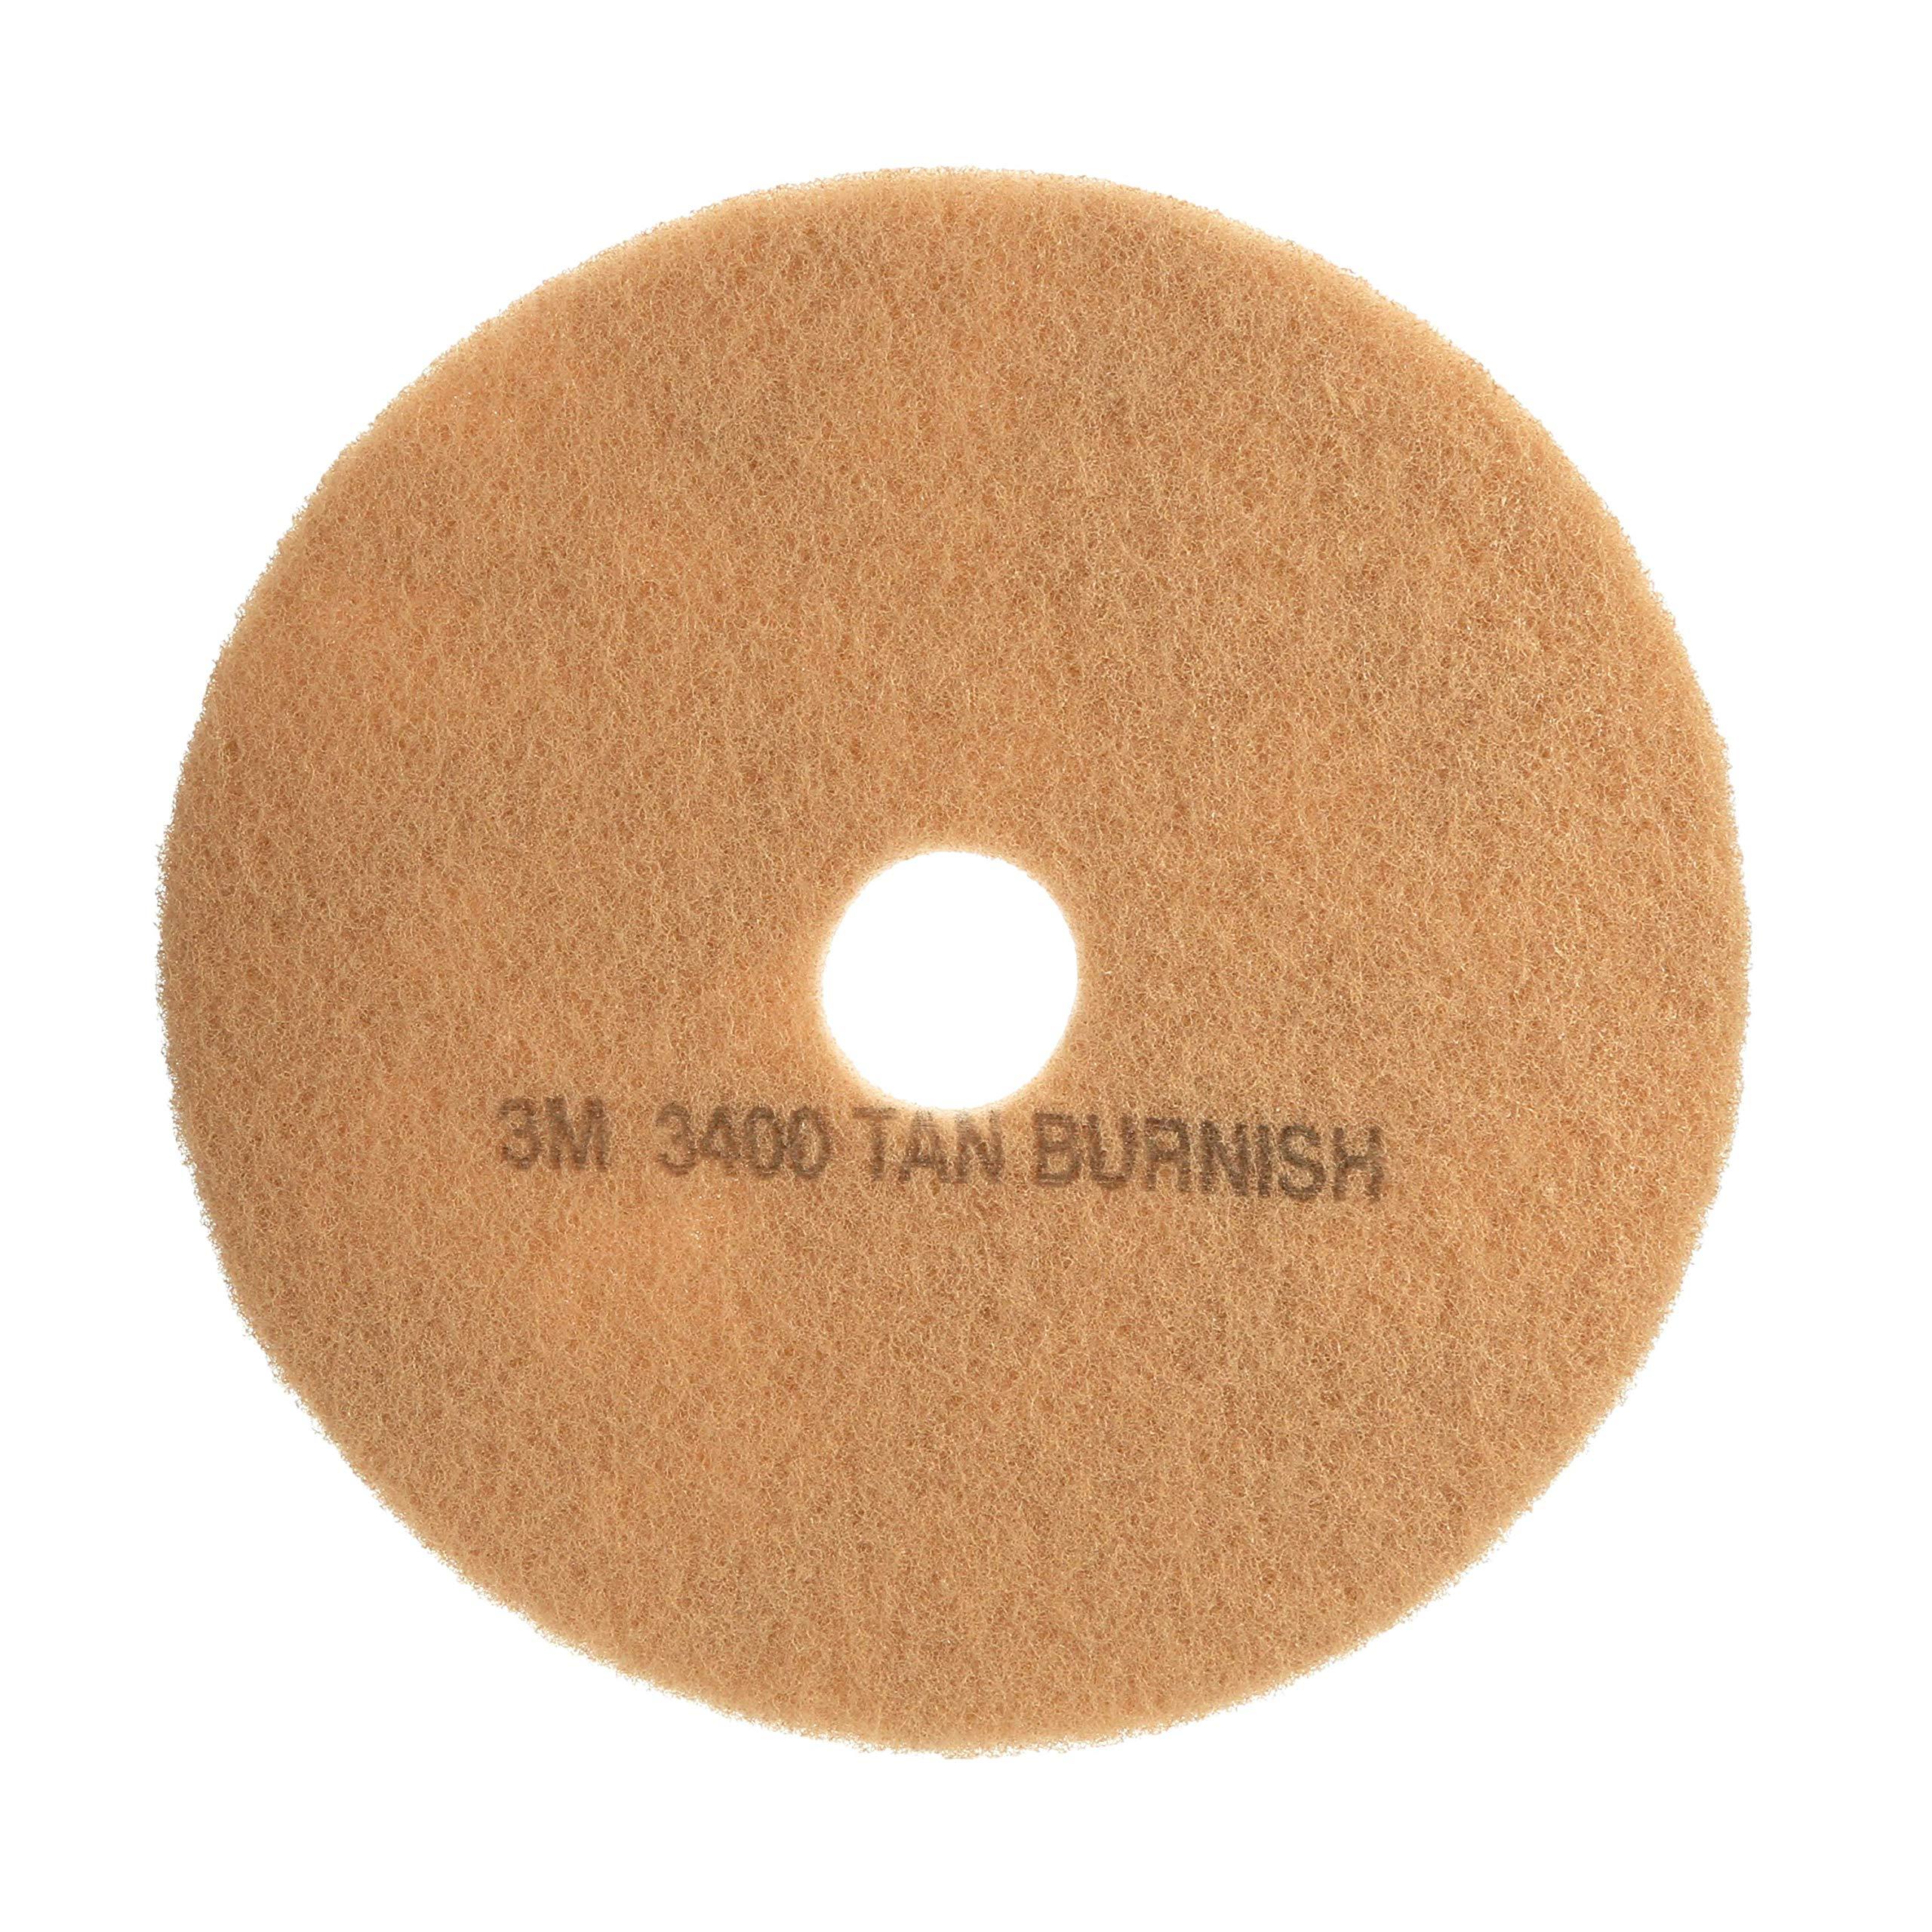 3M Tan Burnish Pad 3400, 20'' Floor Care Pad (Case of 5) by 3M